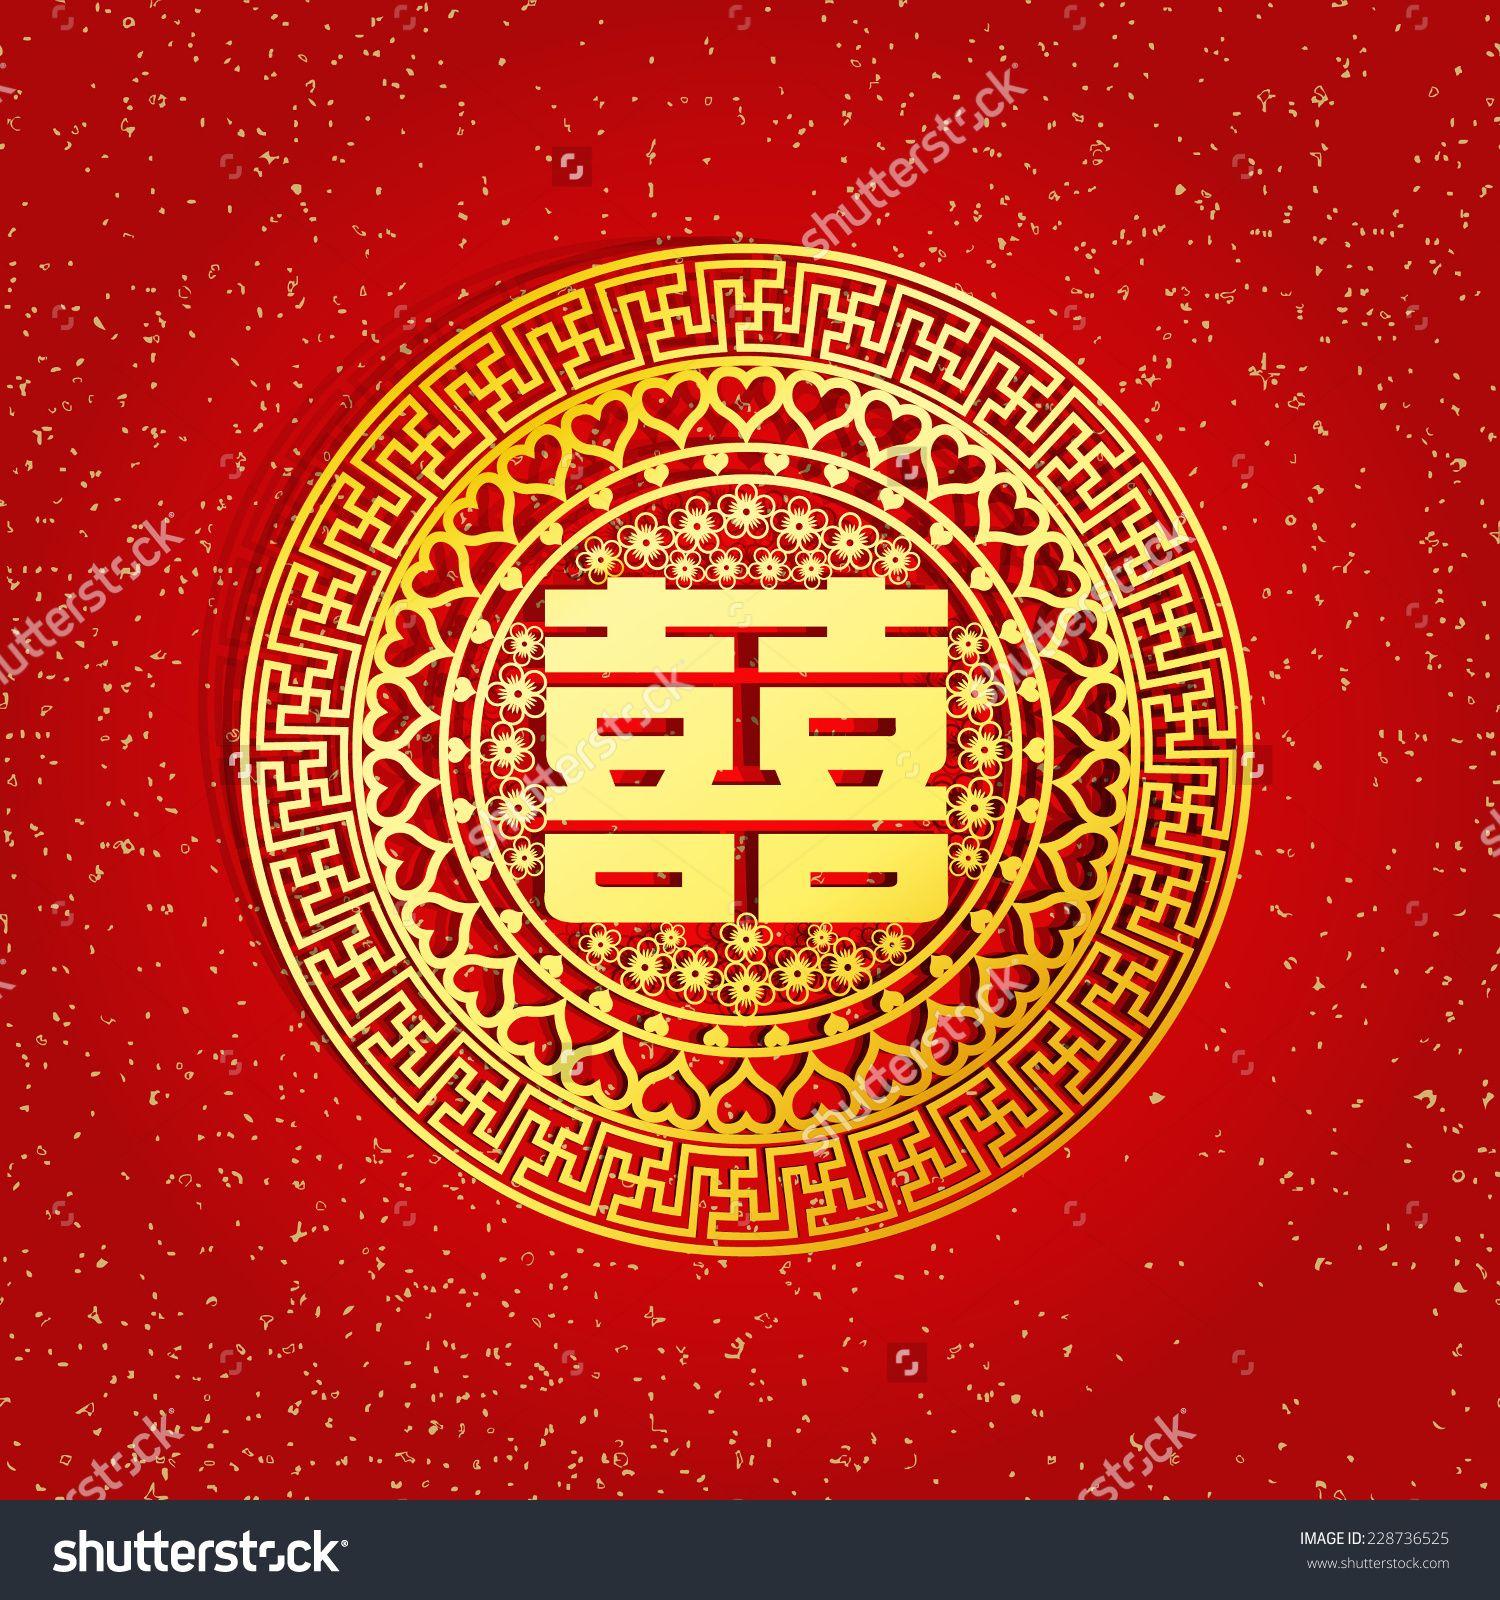 Pin by rhoekstra on asian art culture pinterest symbols icons buycottarizona Gallery